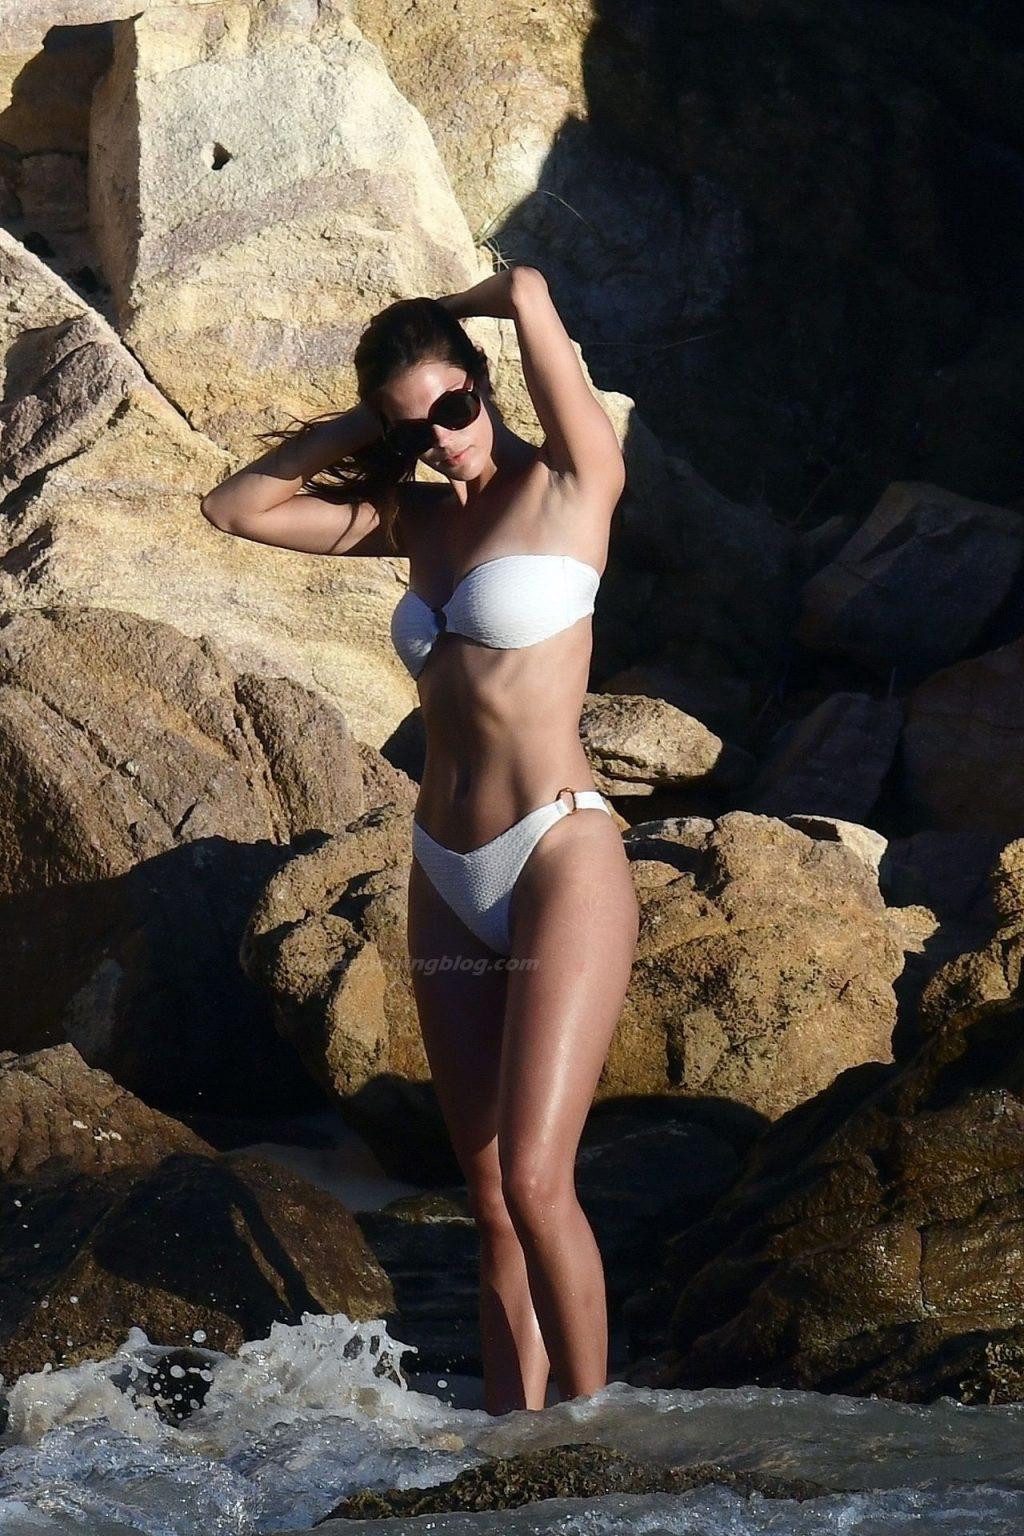 Iris Mittenaere Enjoys a Day at the Beach with Diego El Glaoui (91 Photos)